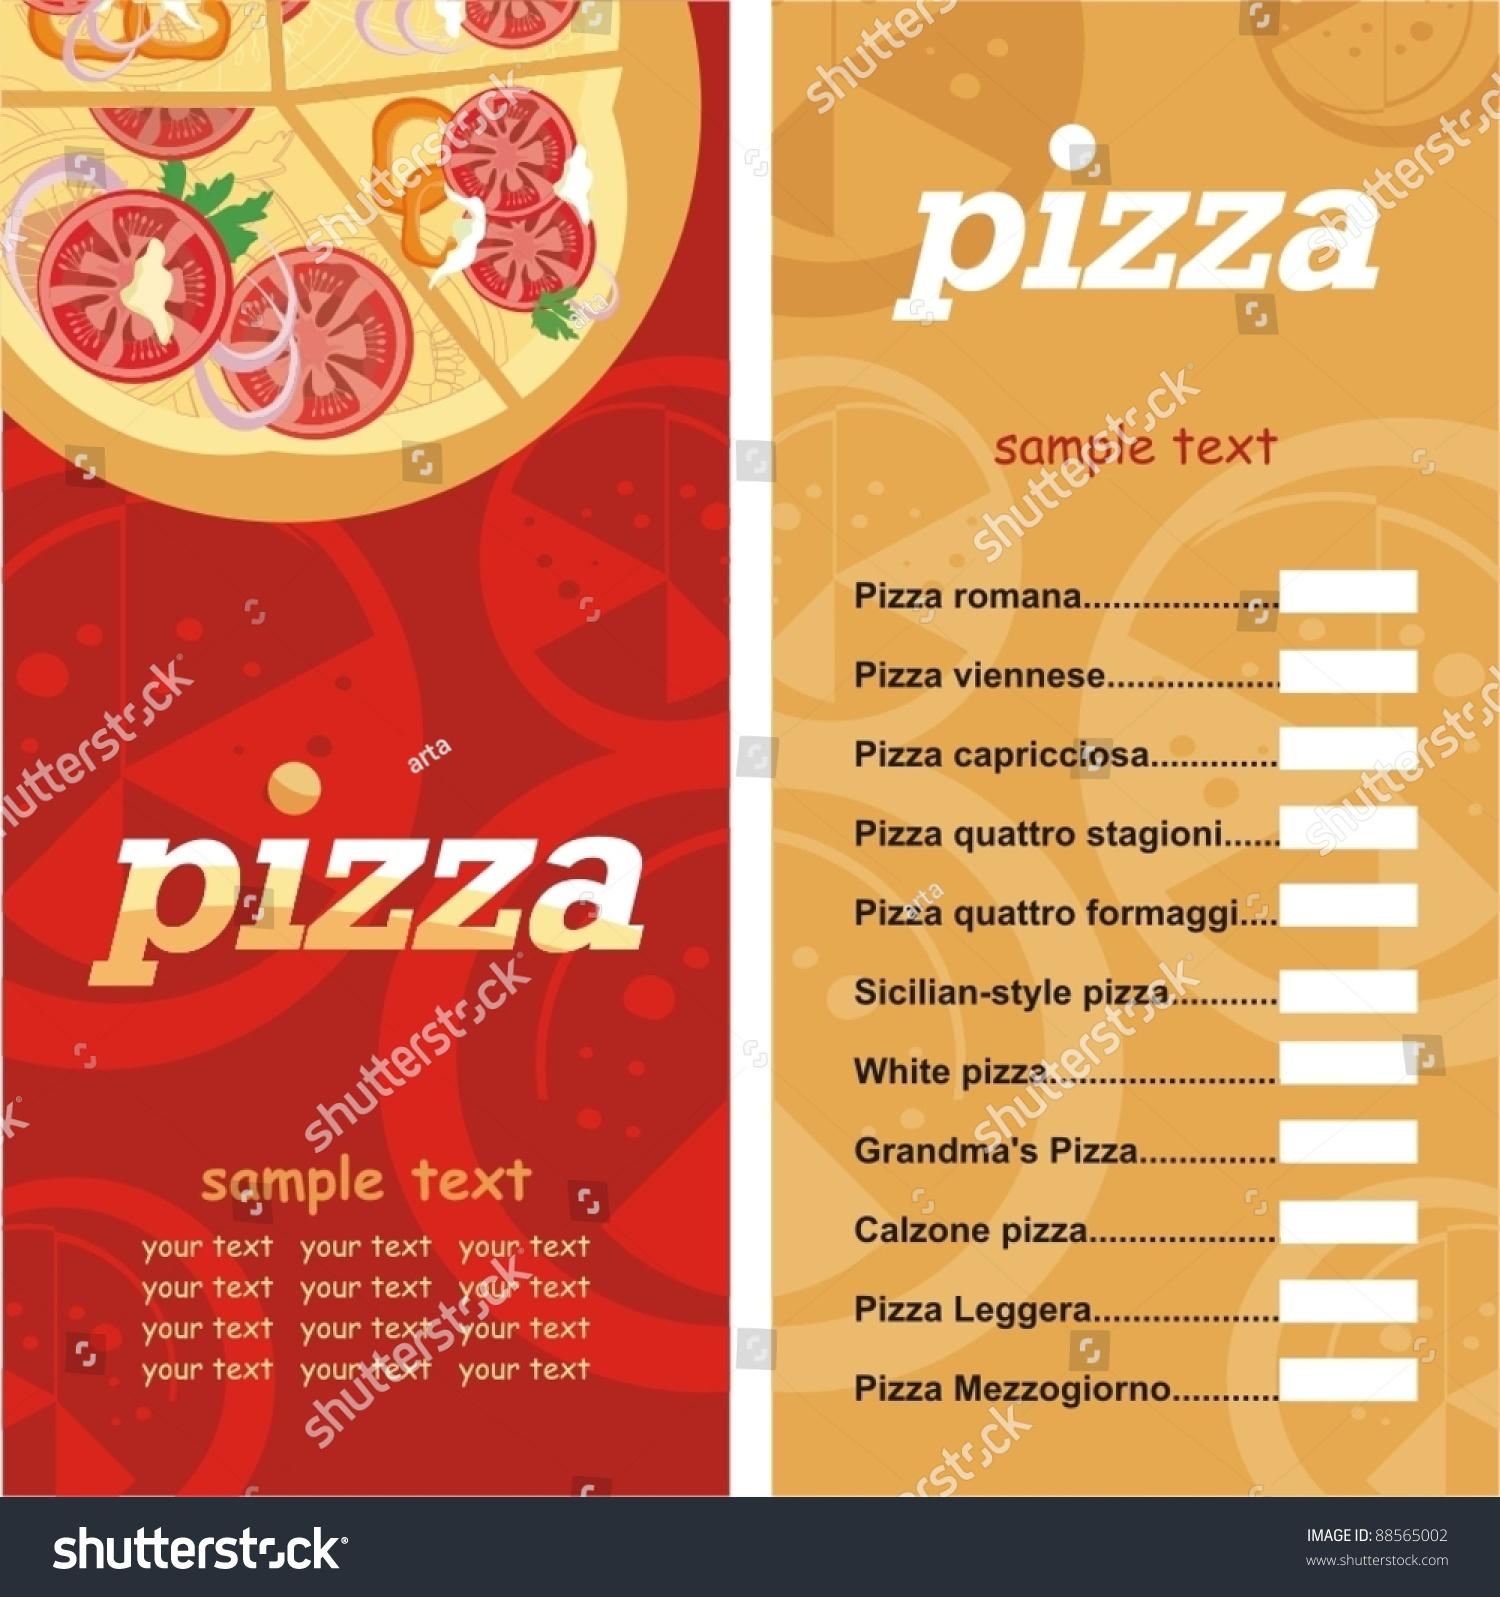 Pizza Menu Template Vector Illustration Vector 88565002 – Sample Pizza Menu Template